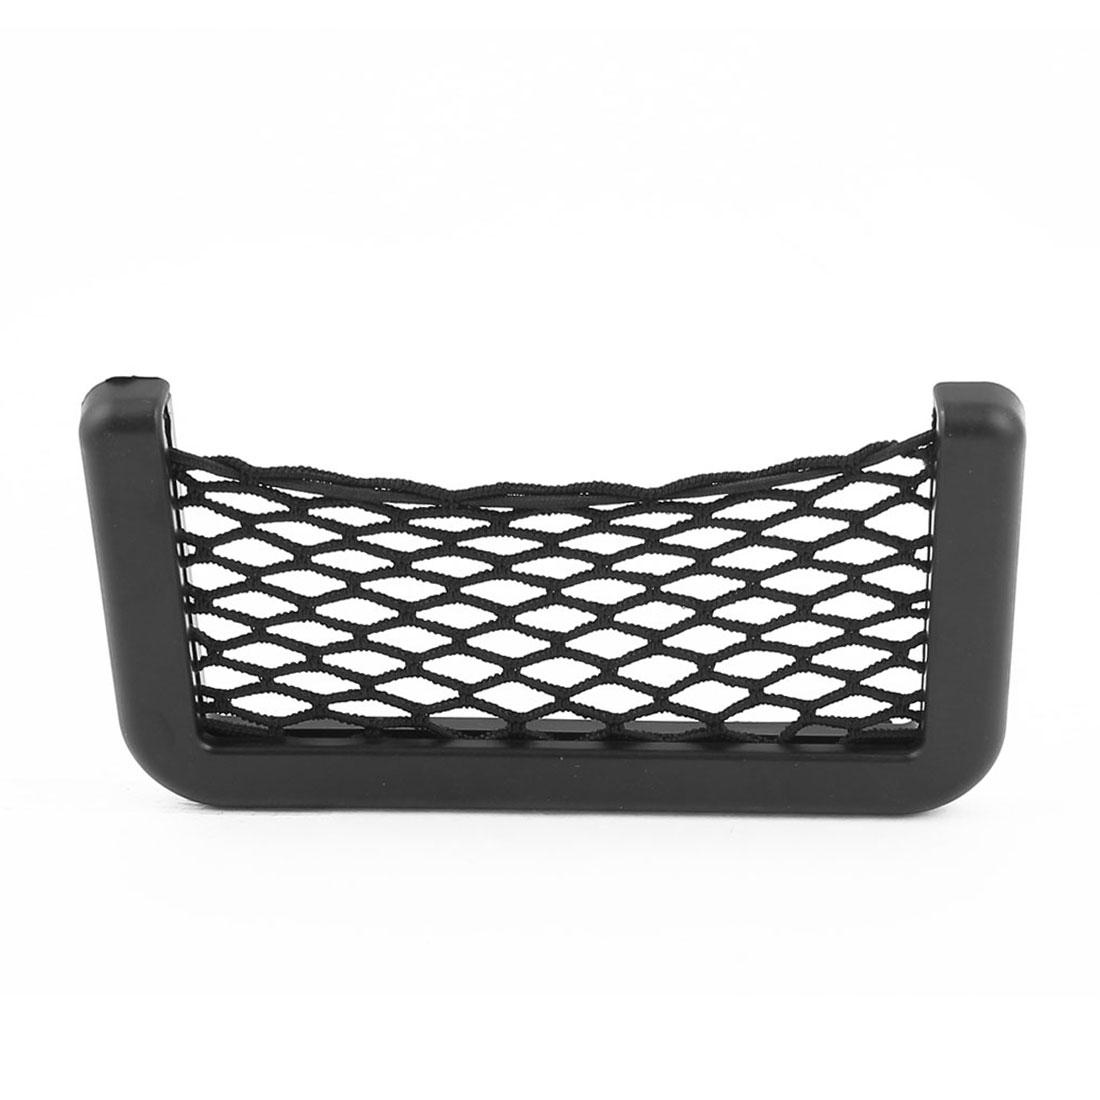 Car Storage Mesh Net Resilient String Bag Pocket Phone Holder Organizer Black